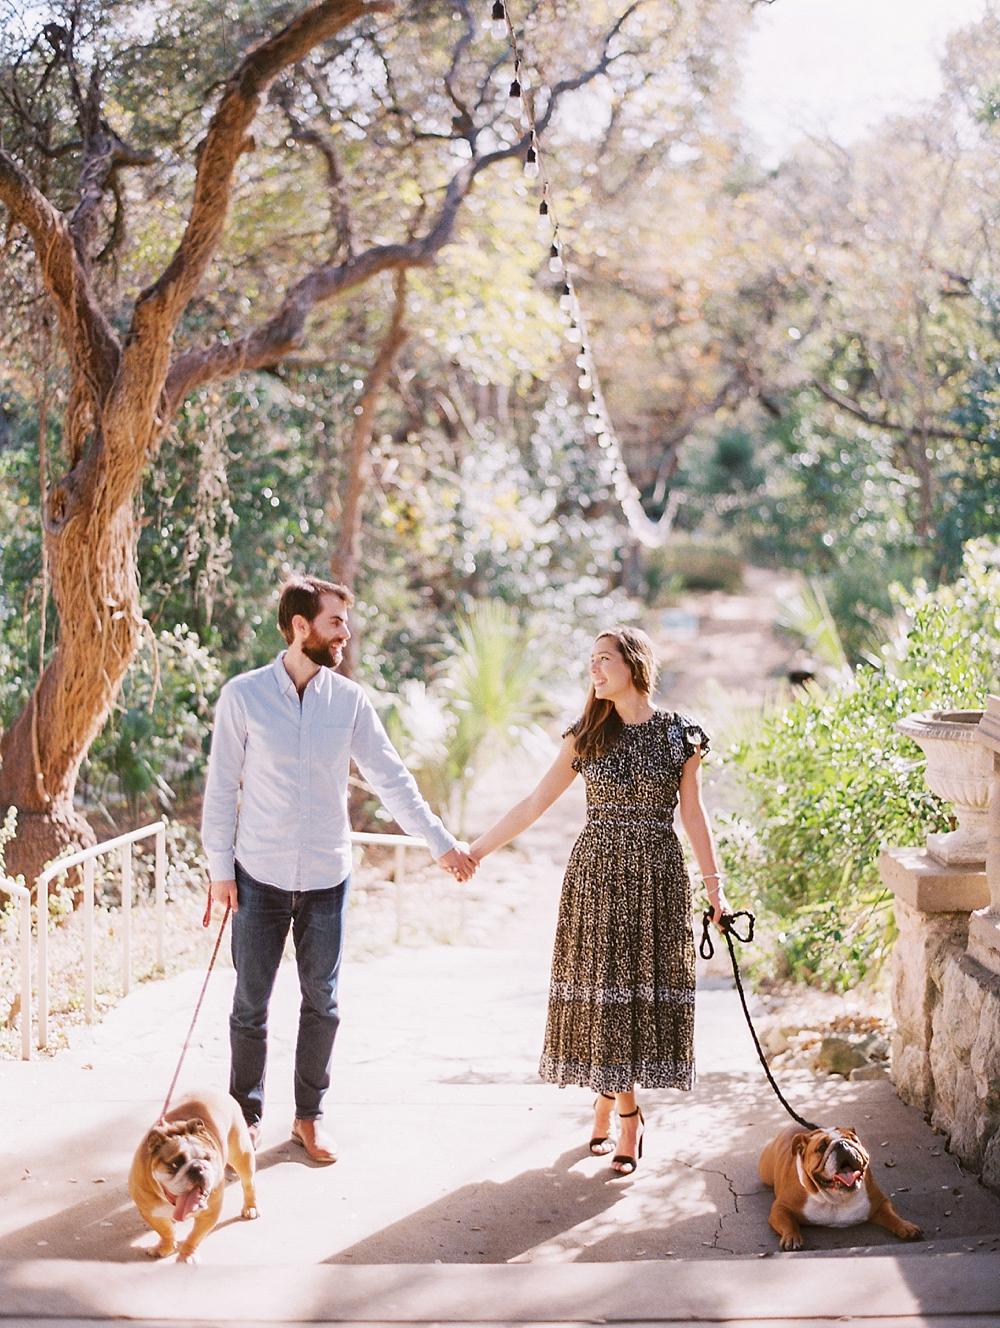 kristin-la-voie-photography-Austin-Wedding-Photographer-laguna-gloria-commodore-perry-estate-engagement-58